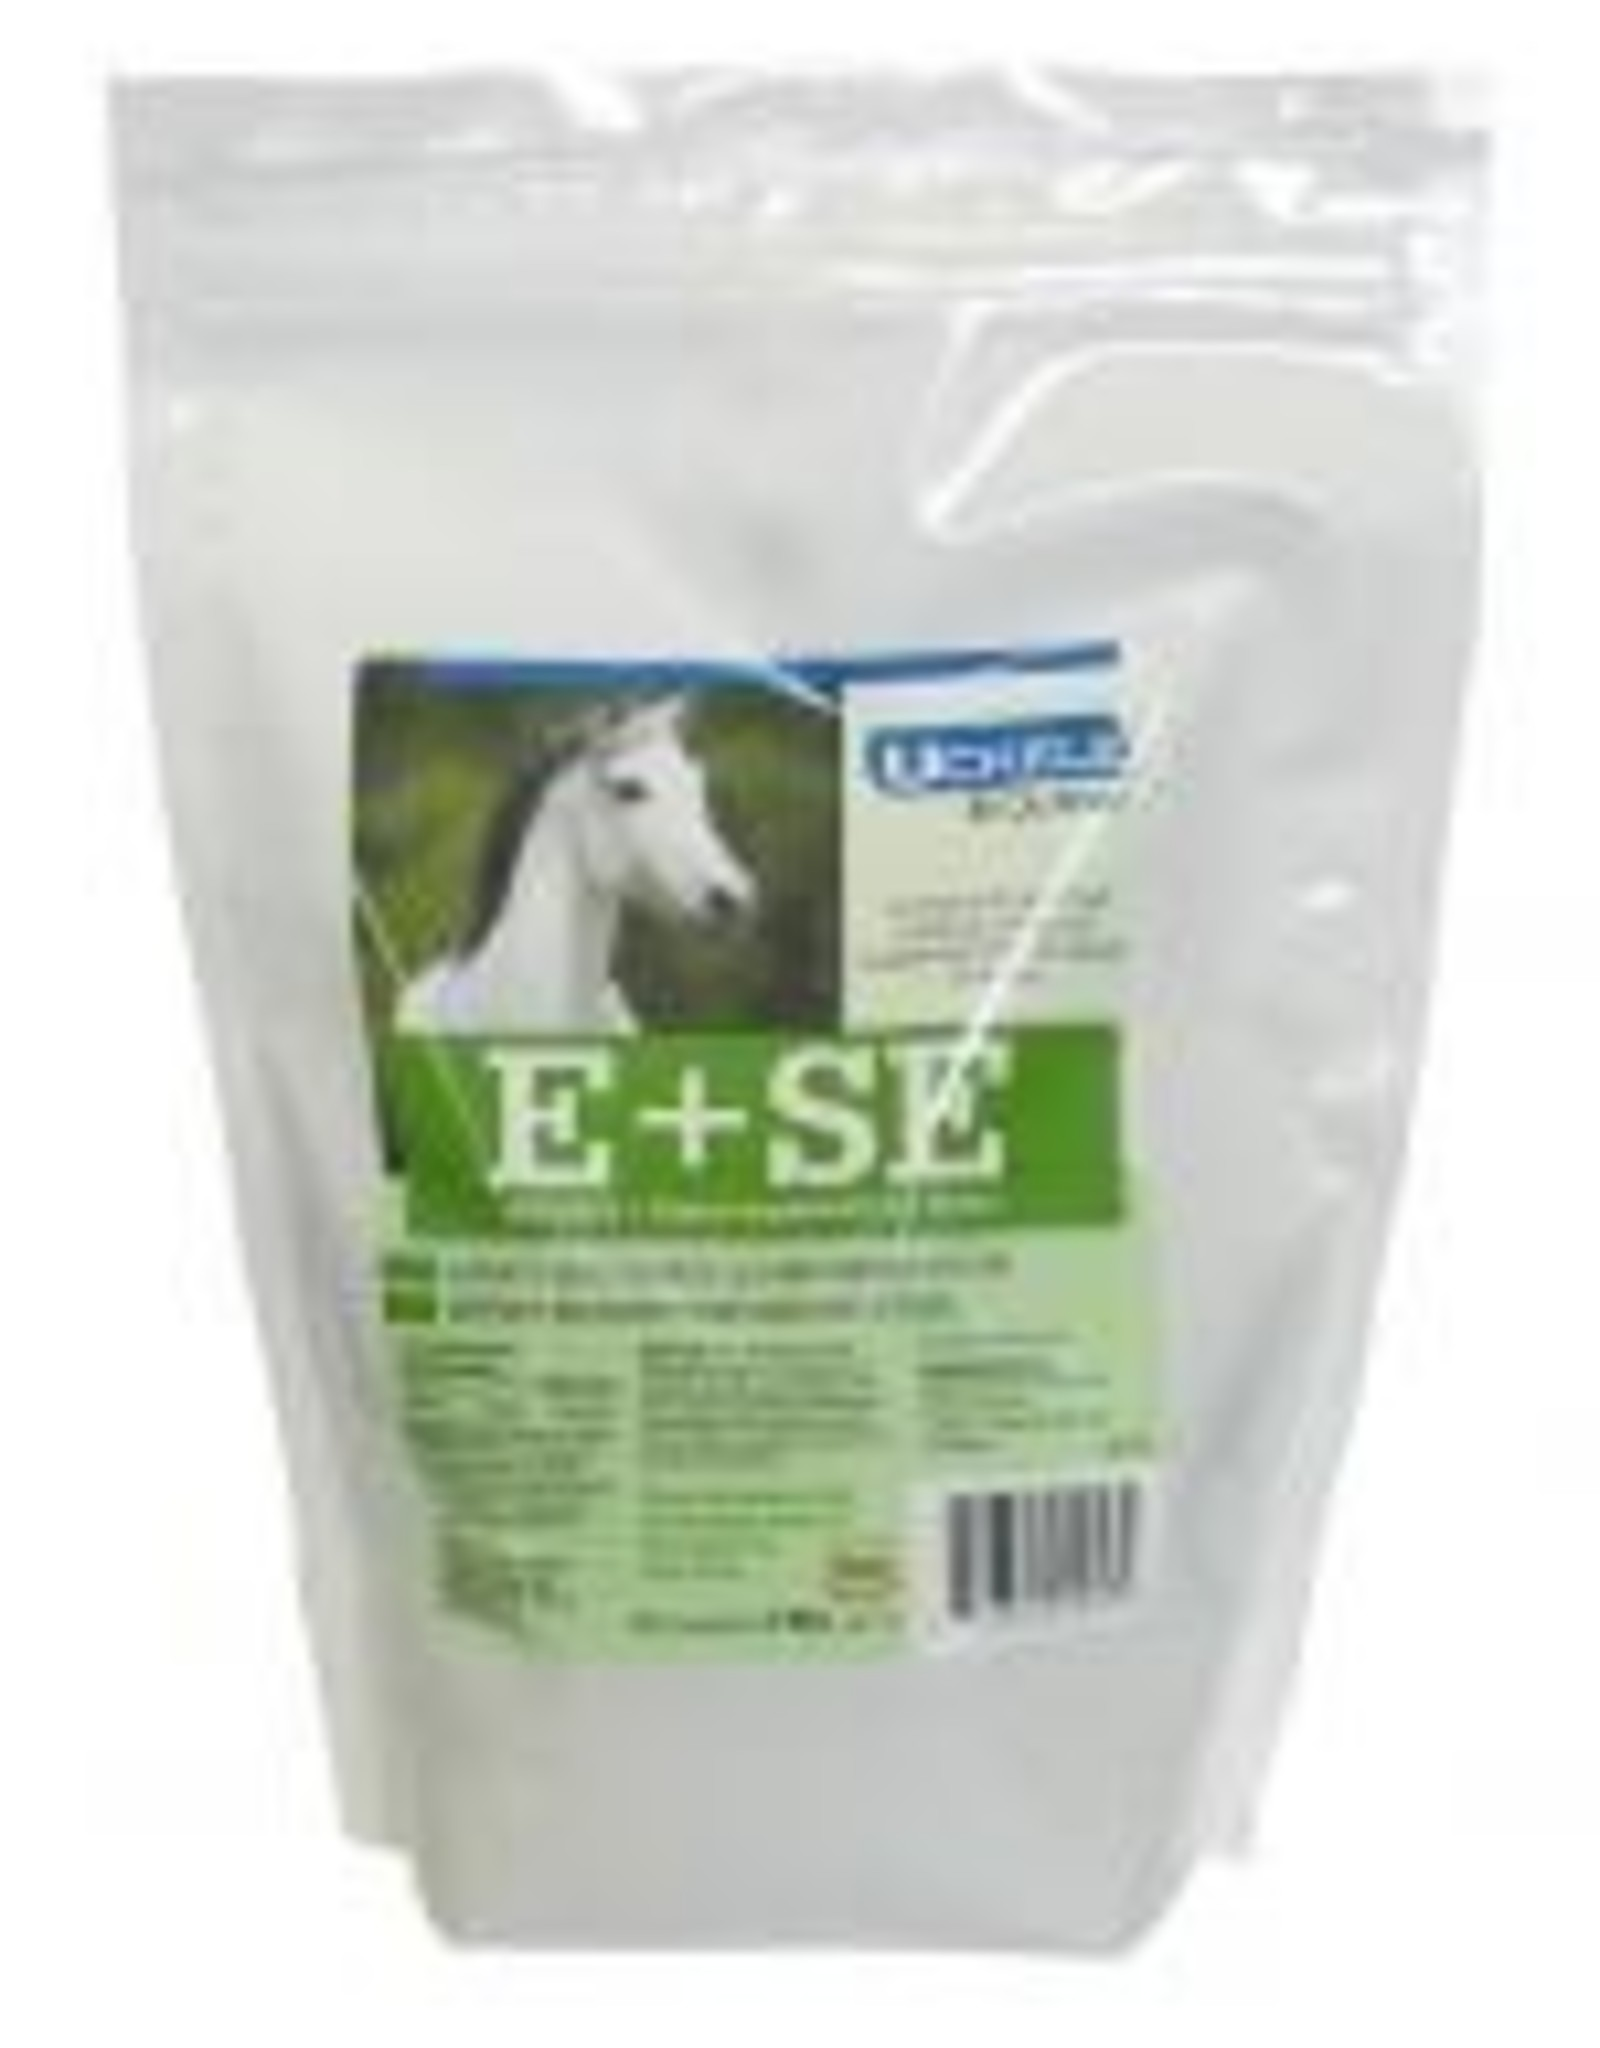 Uckele E + Se 2 lb